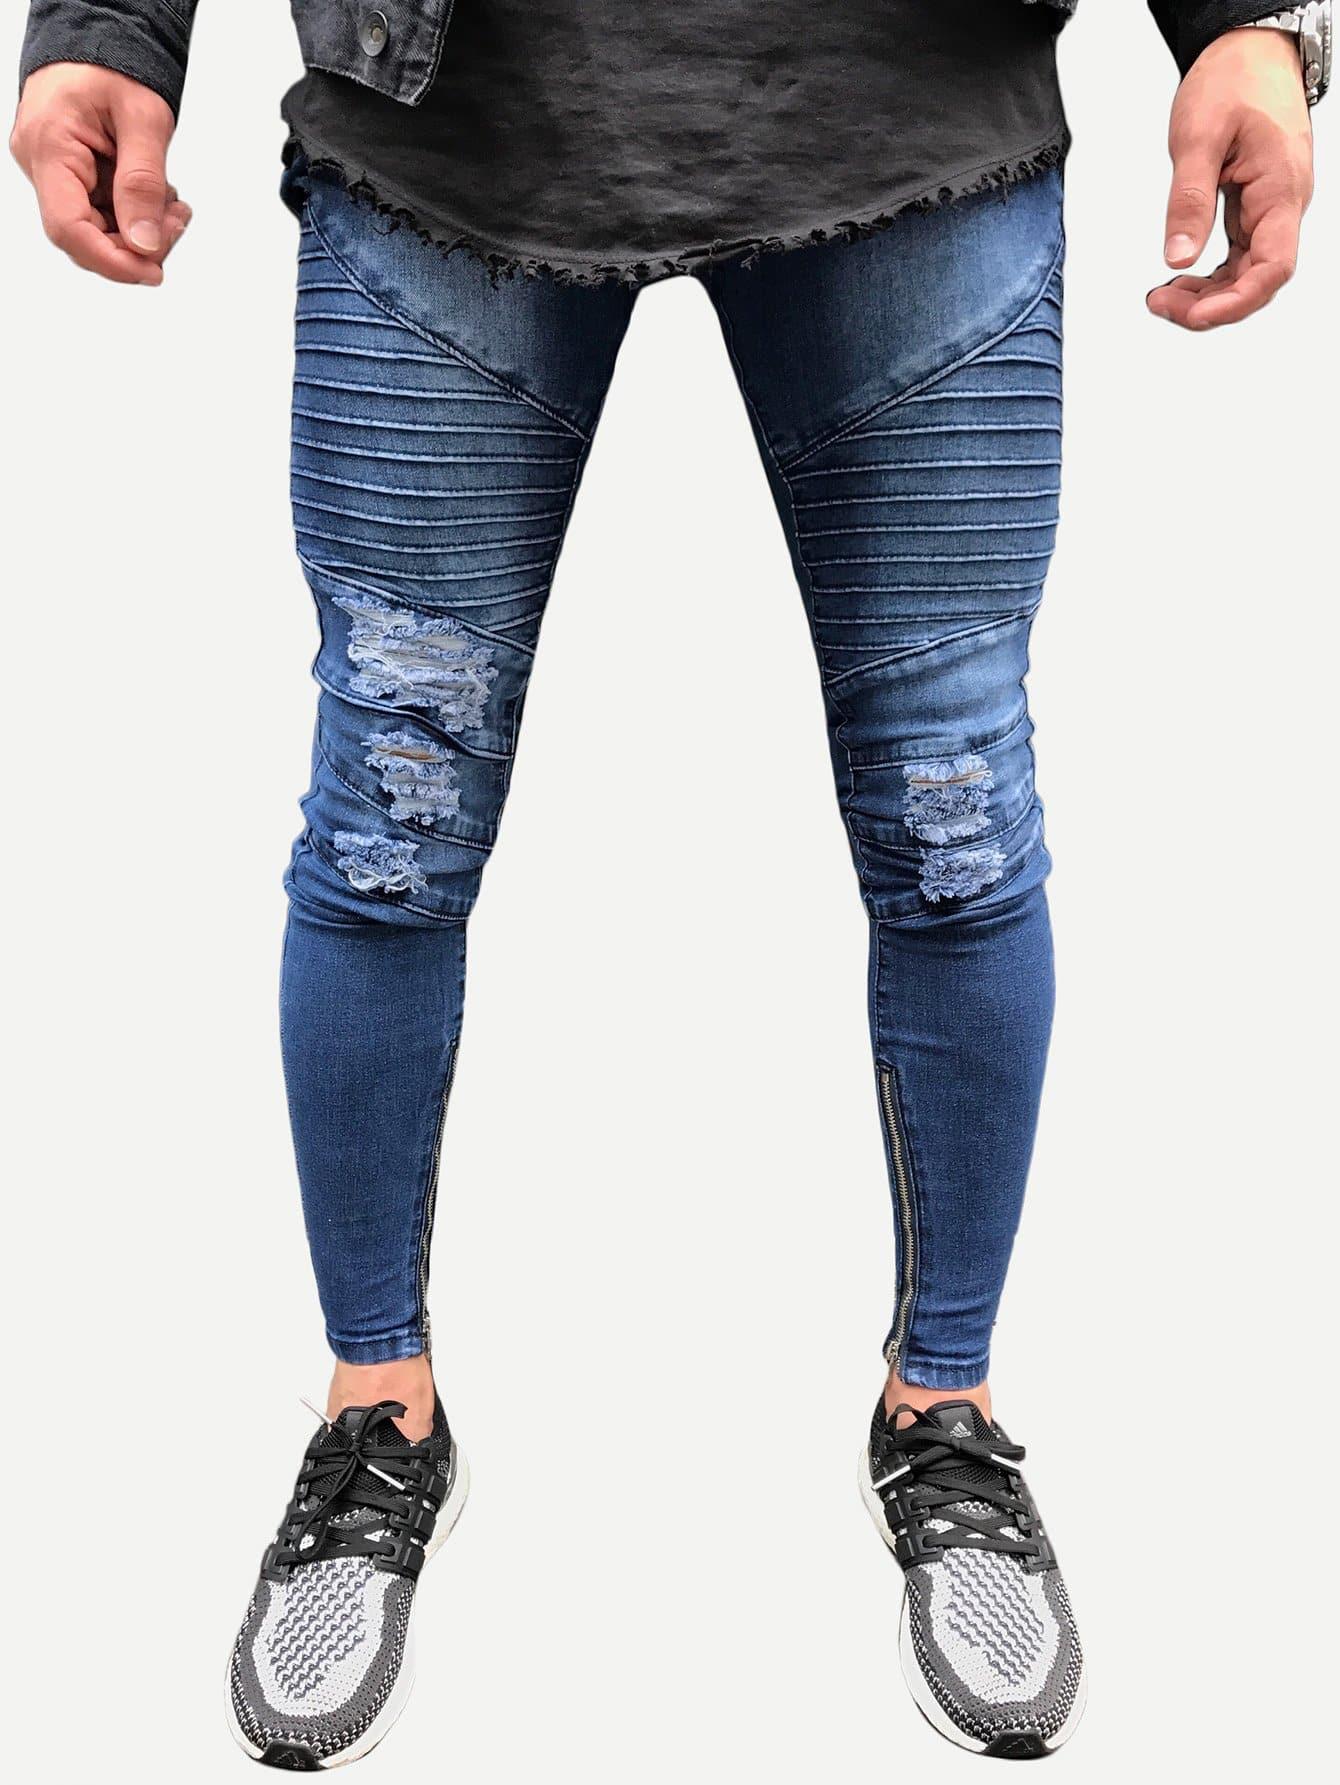 Men Zip Decoration Destroyed Skinny Jeans men s classic jeans straight full length casual hip hop zip pocket biker jeans fashion slim skinny jeans men big sizes 29 42